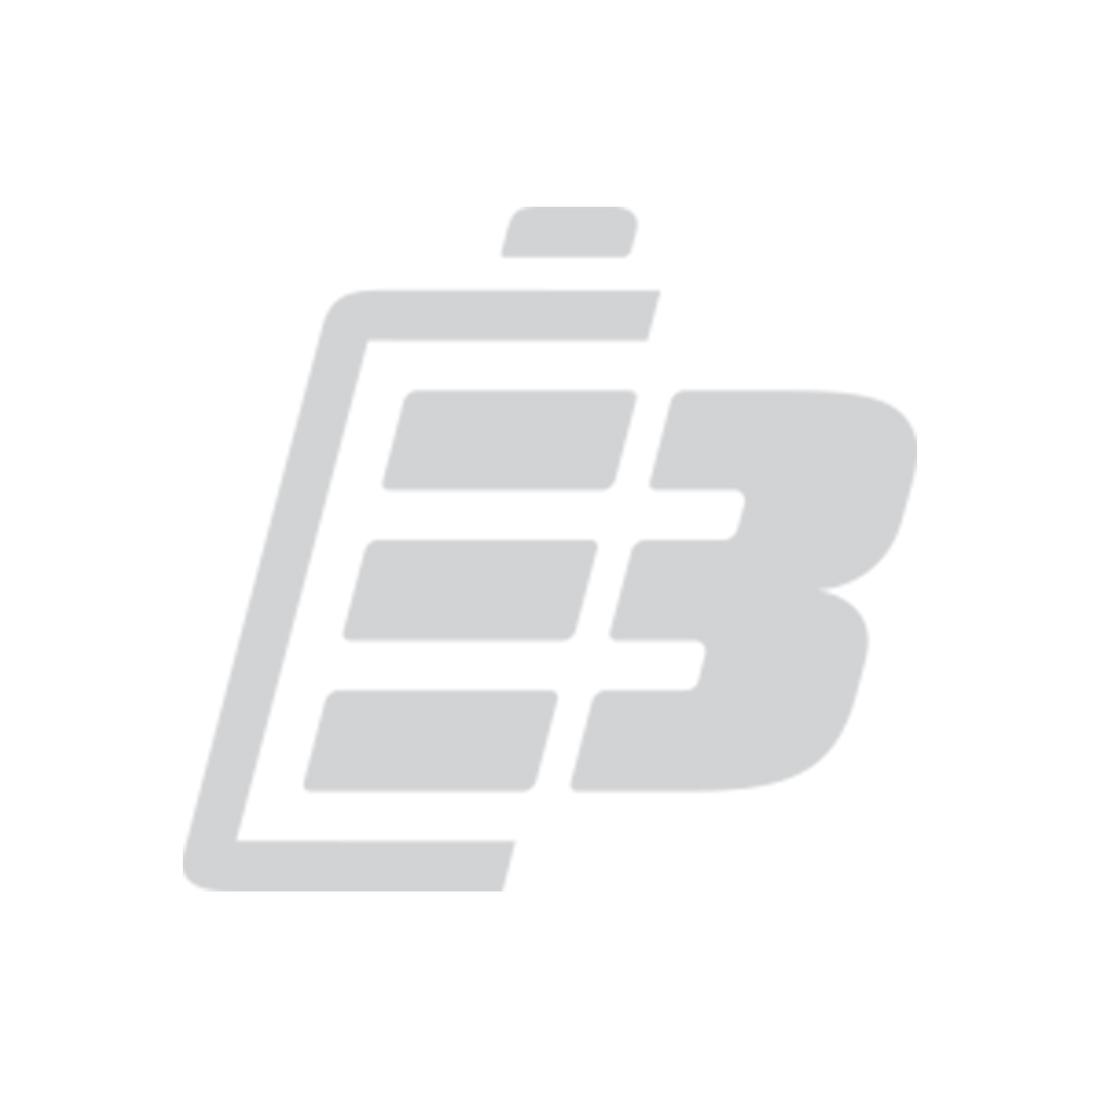 Laptop battery Asus M50_1